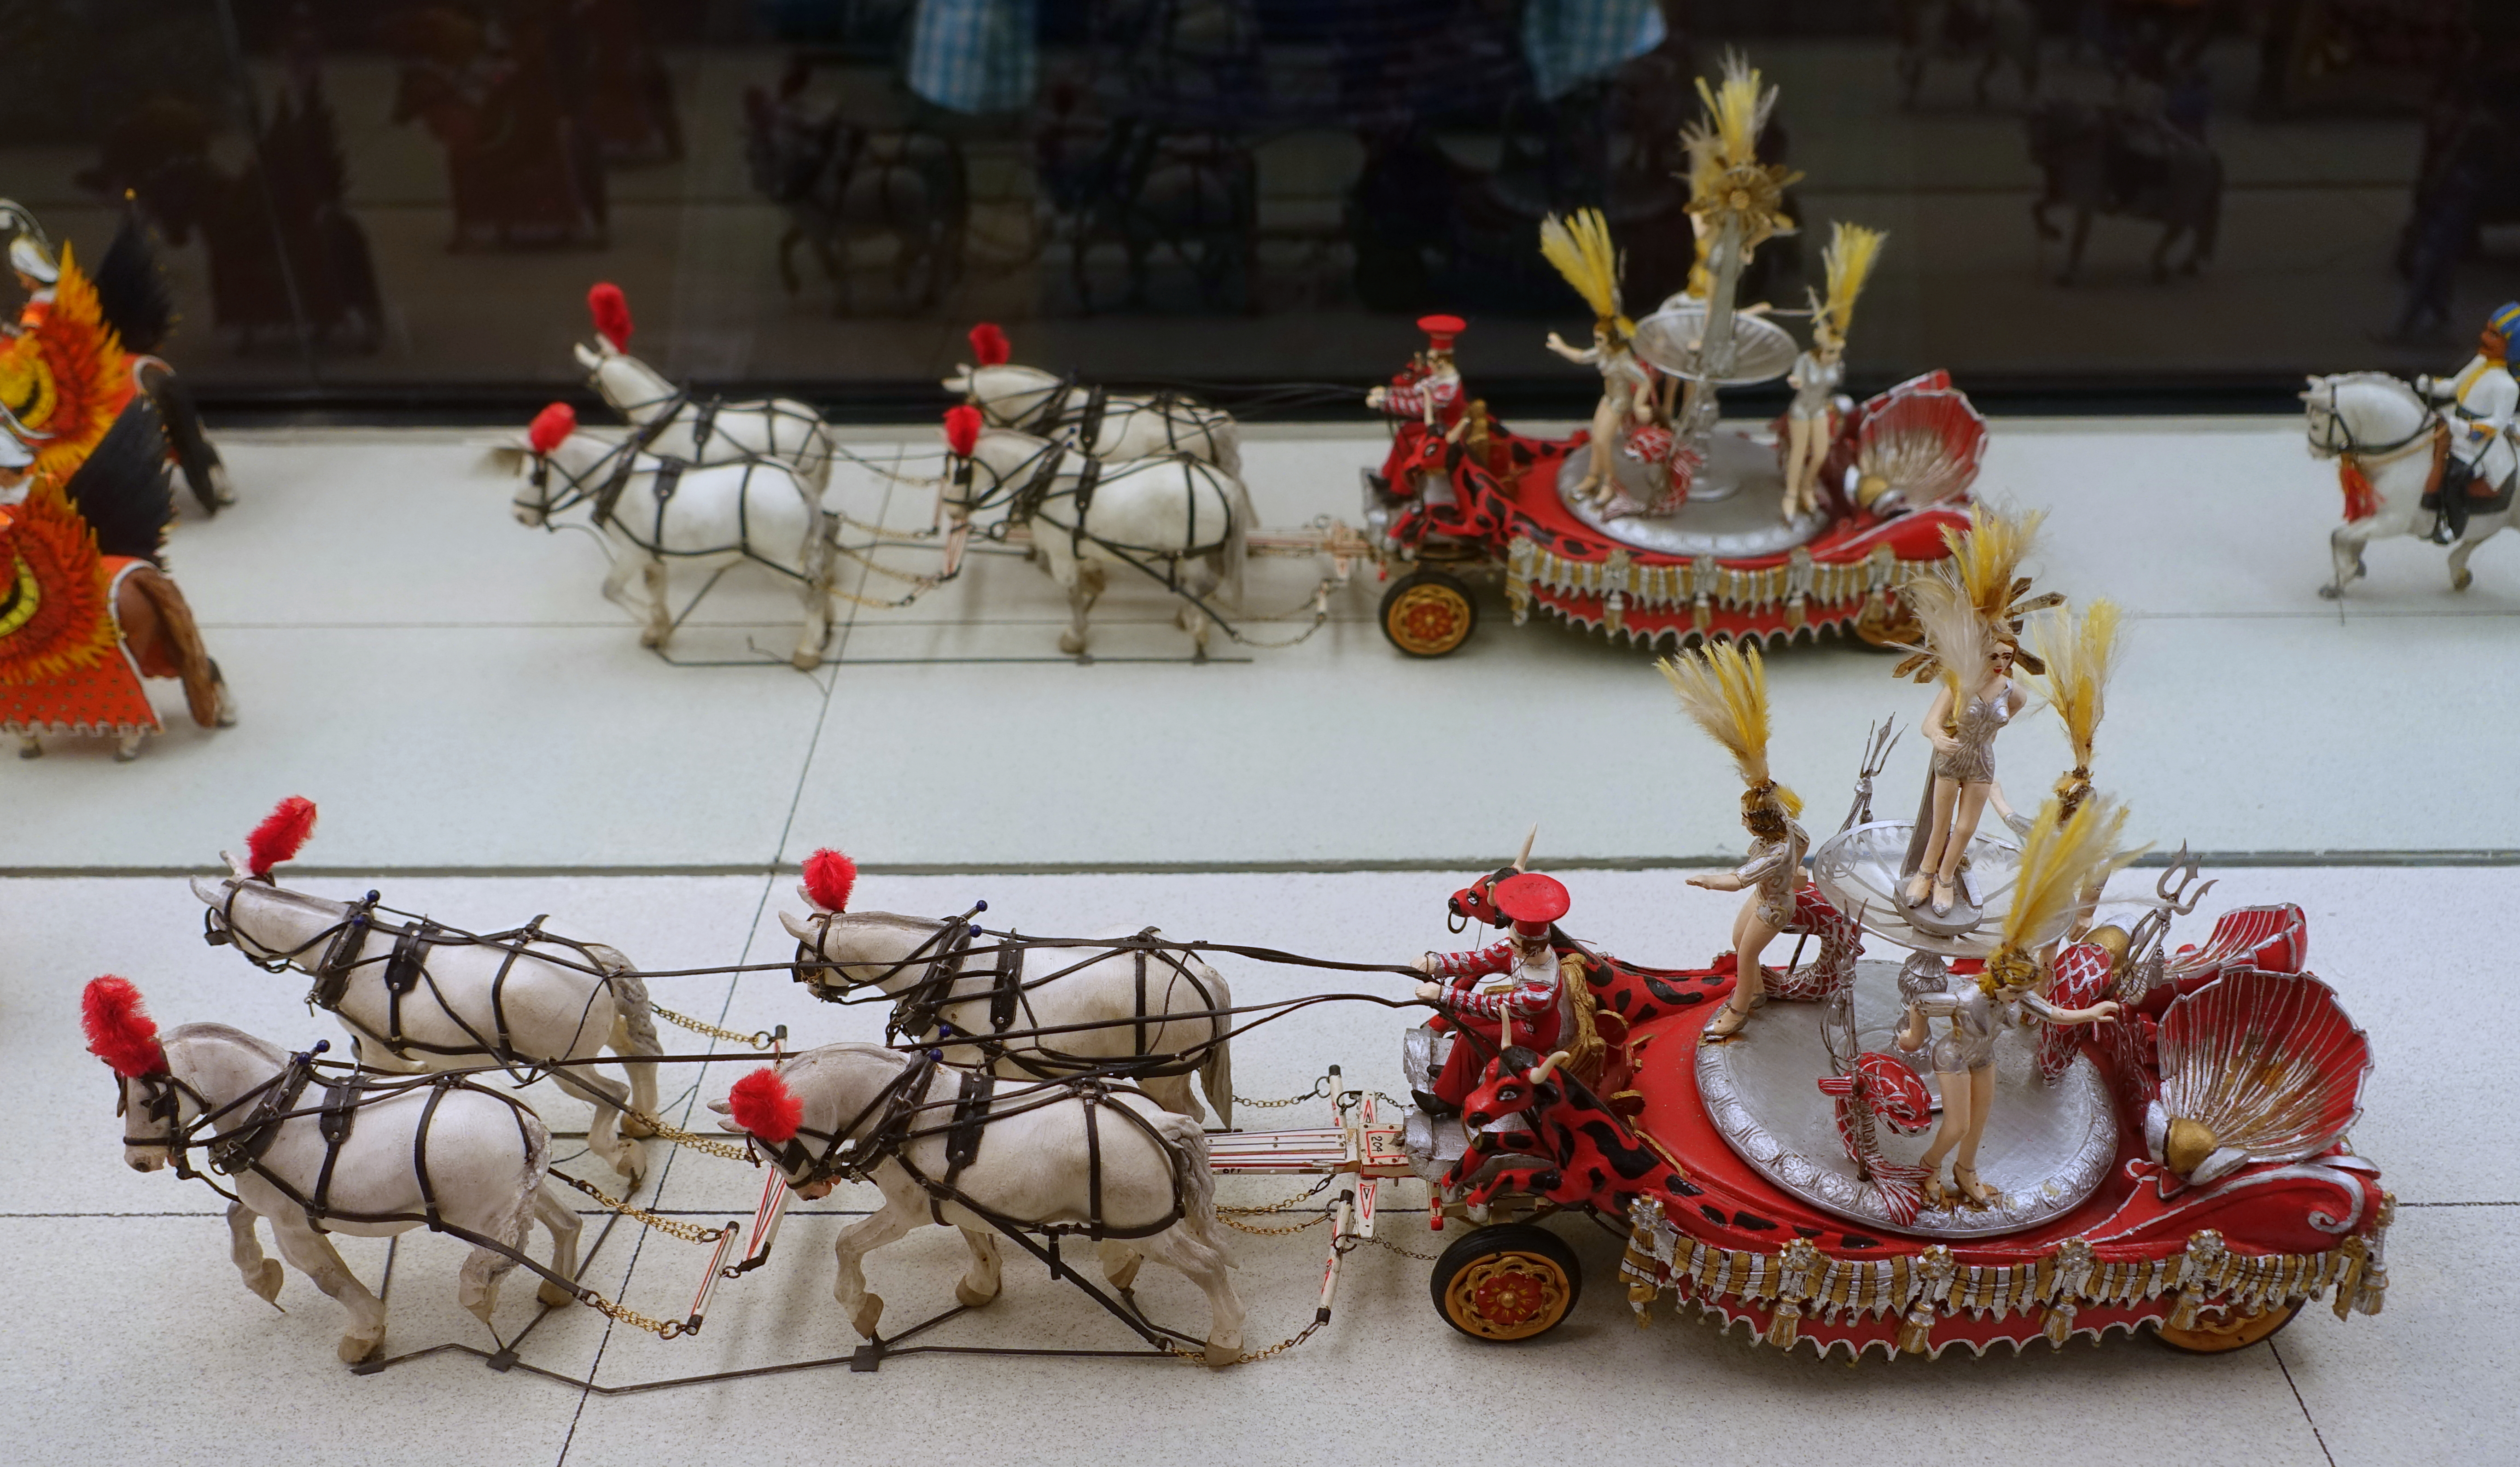 File Parade Miniature Circus Museum John And Mable Ringling Museum Of Art Sarasota Fl Dsc00208 Jpg Wikimedia Commons